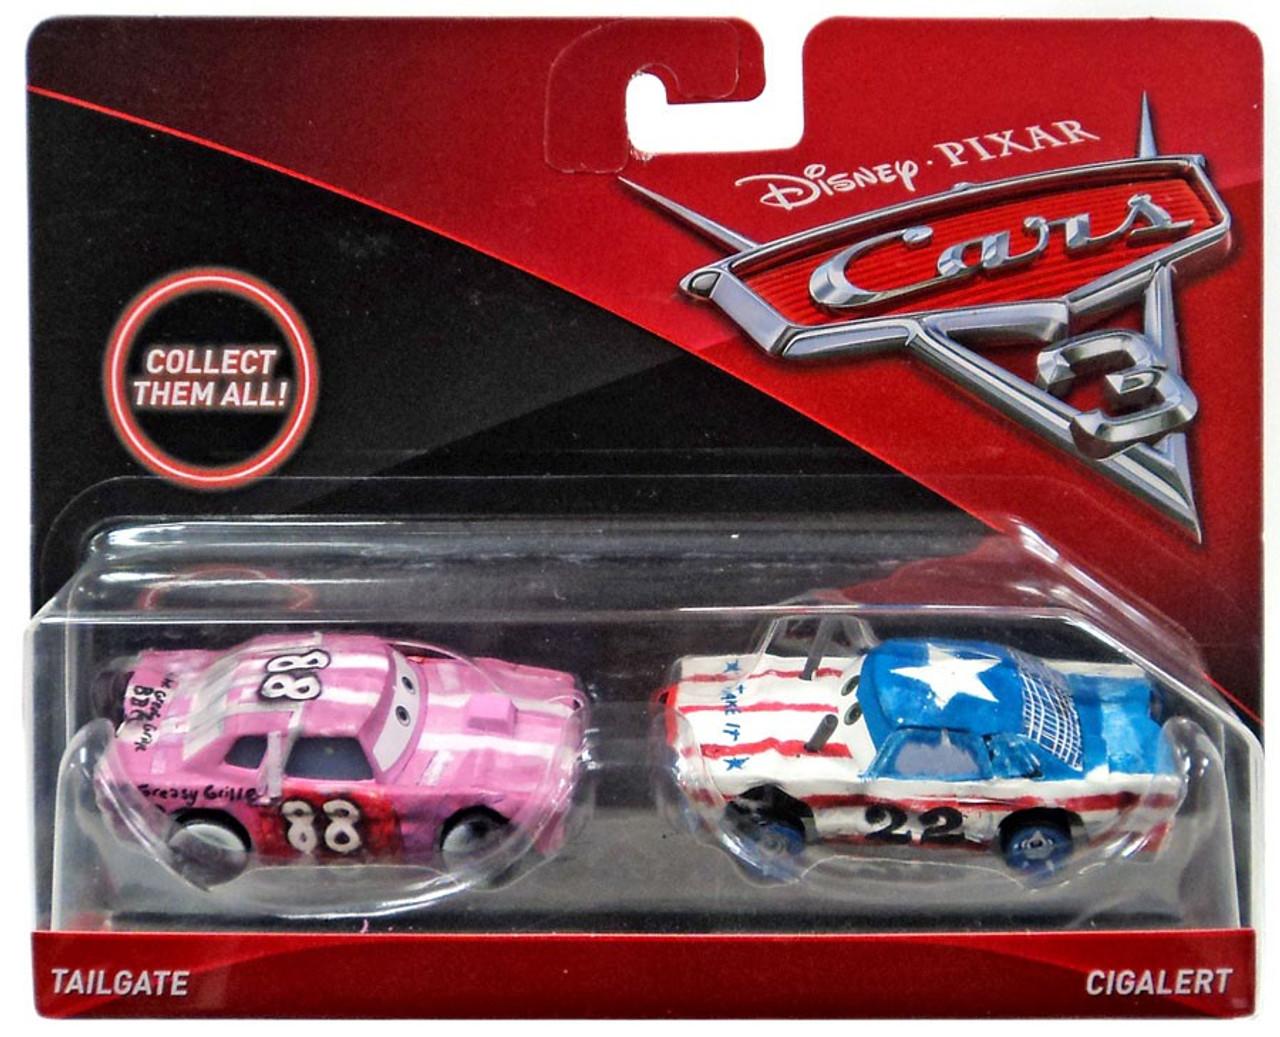 Disney Pixar Cars Cars 3 Tailgate Cigalert 155 Diecast 2 Pack Mattel